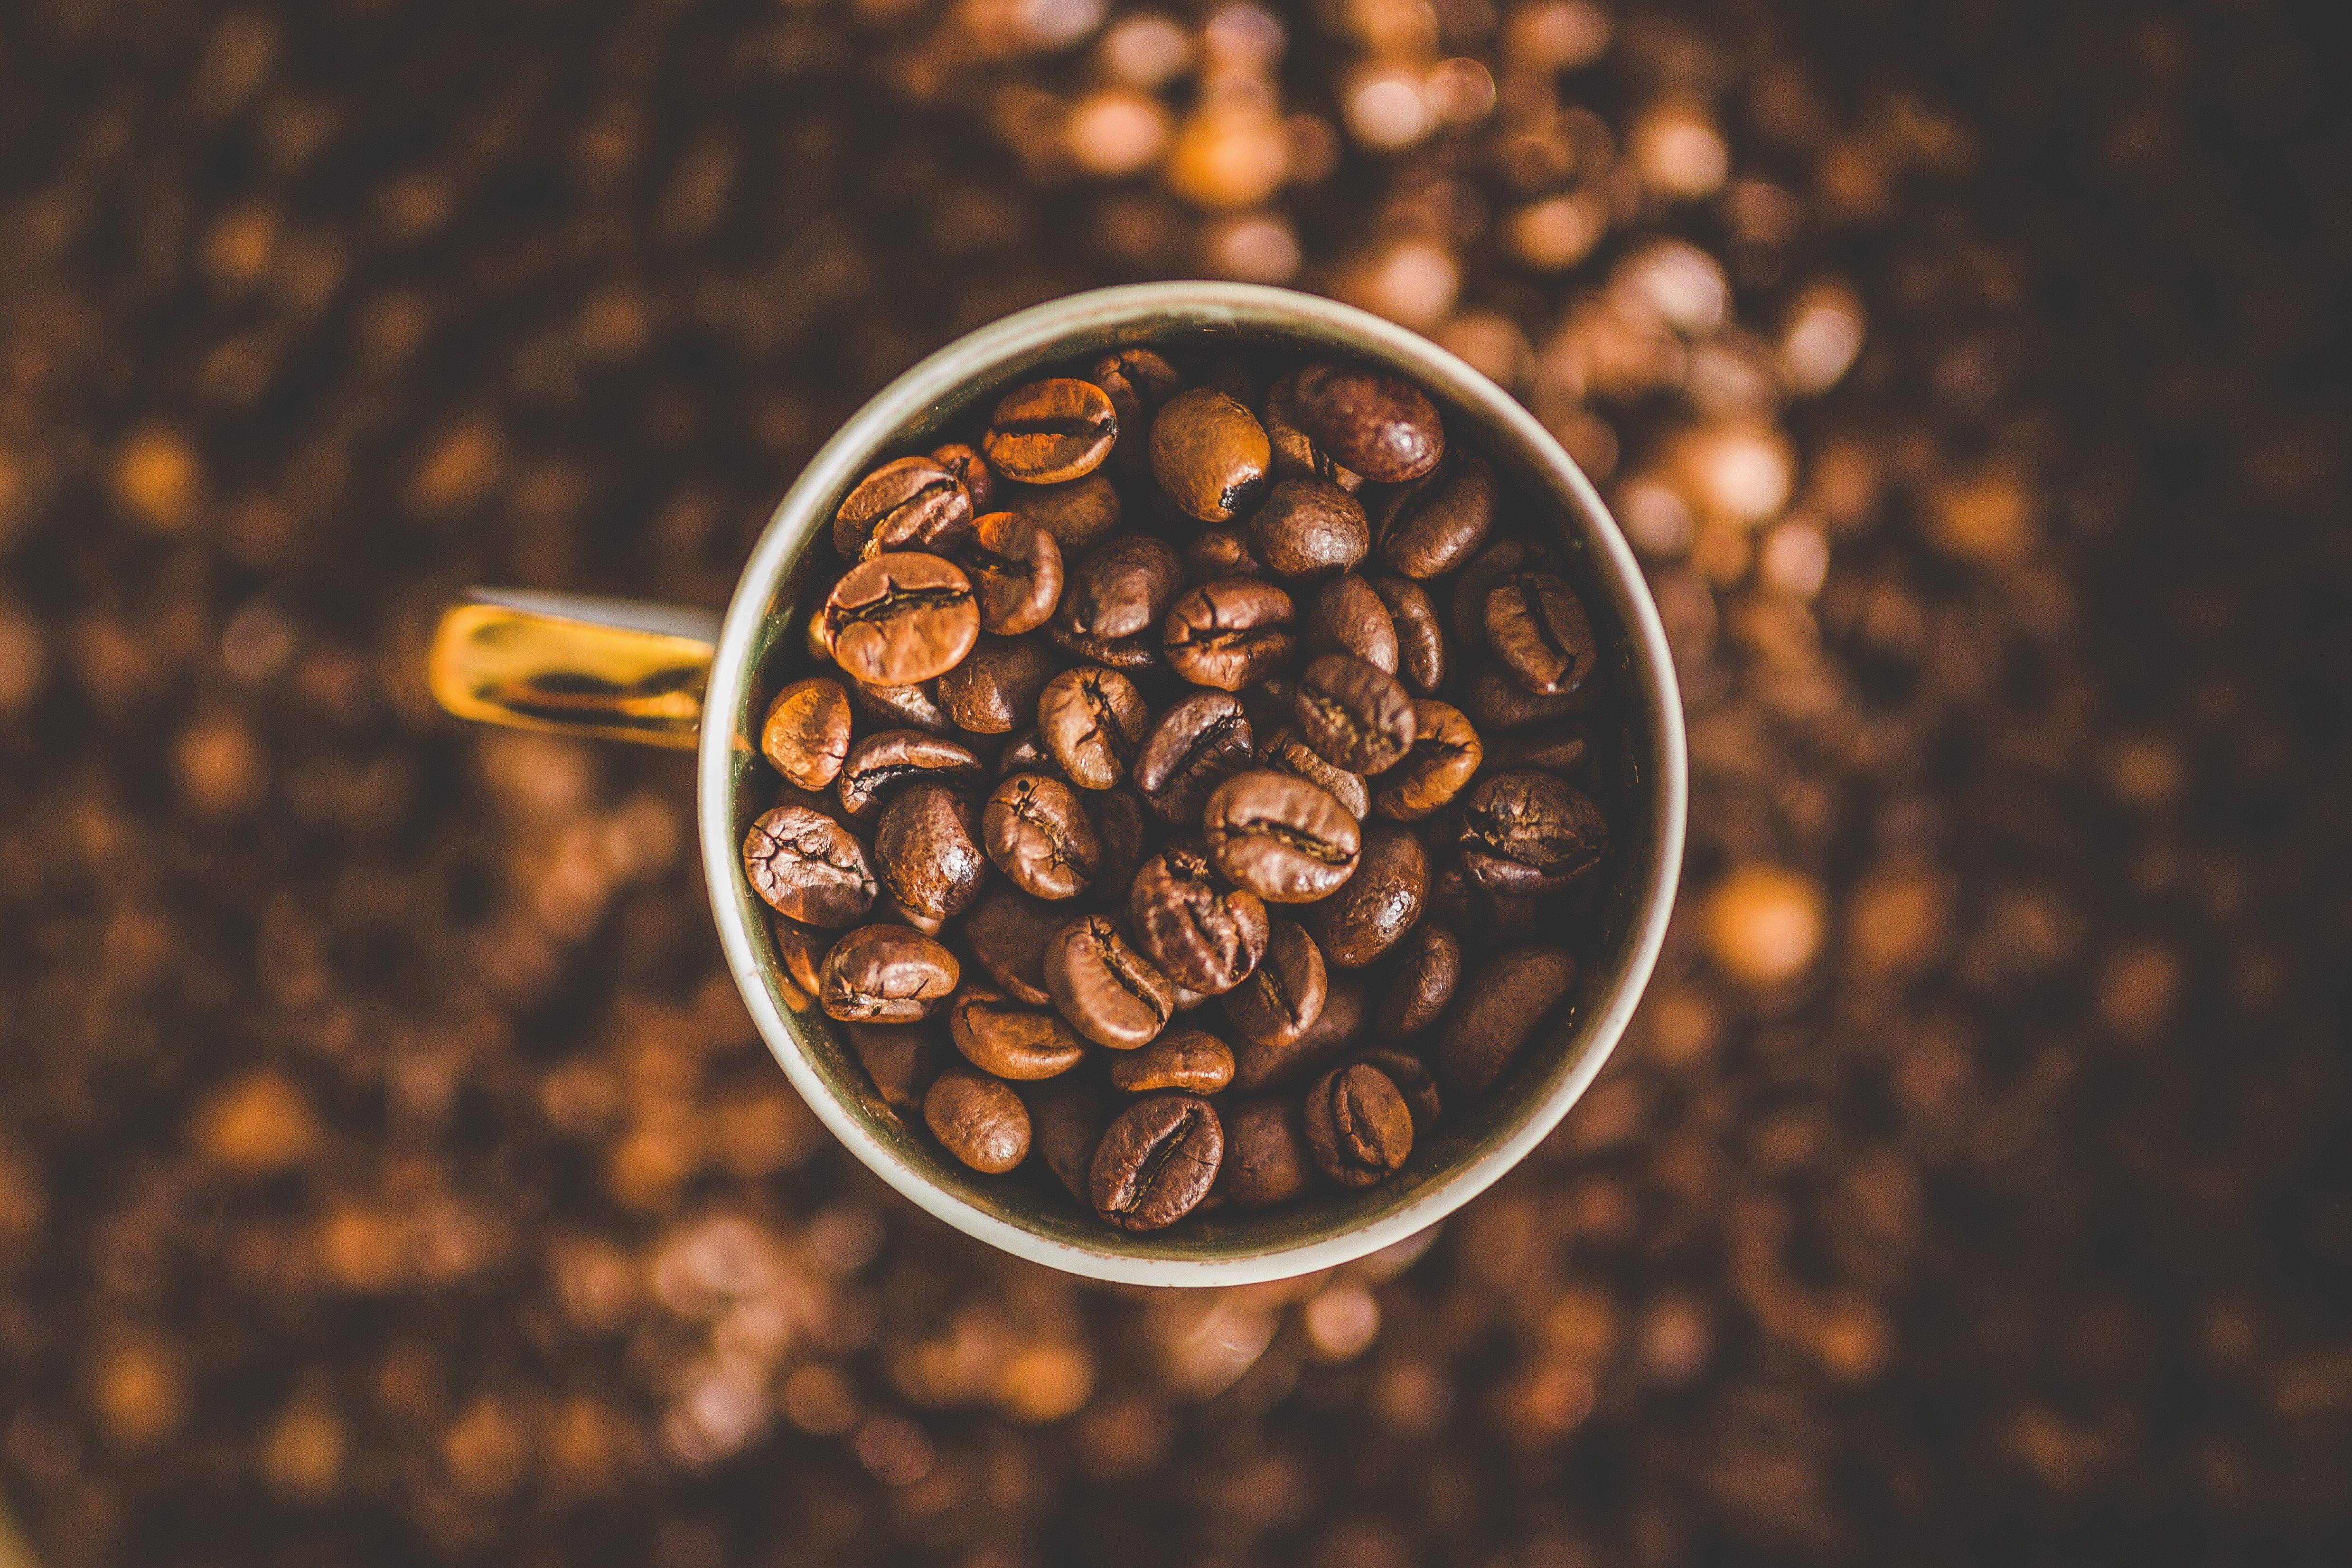 depth of field, Coffee beans, Mugs Wallpaper